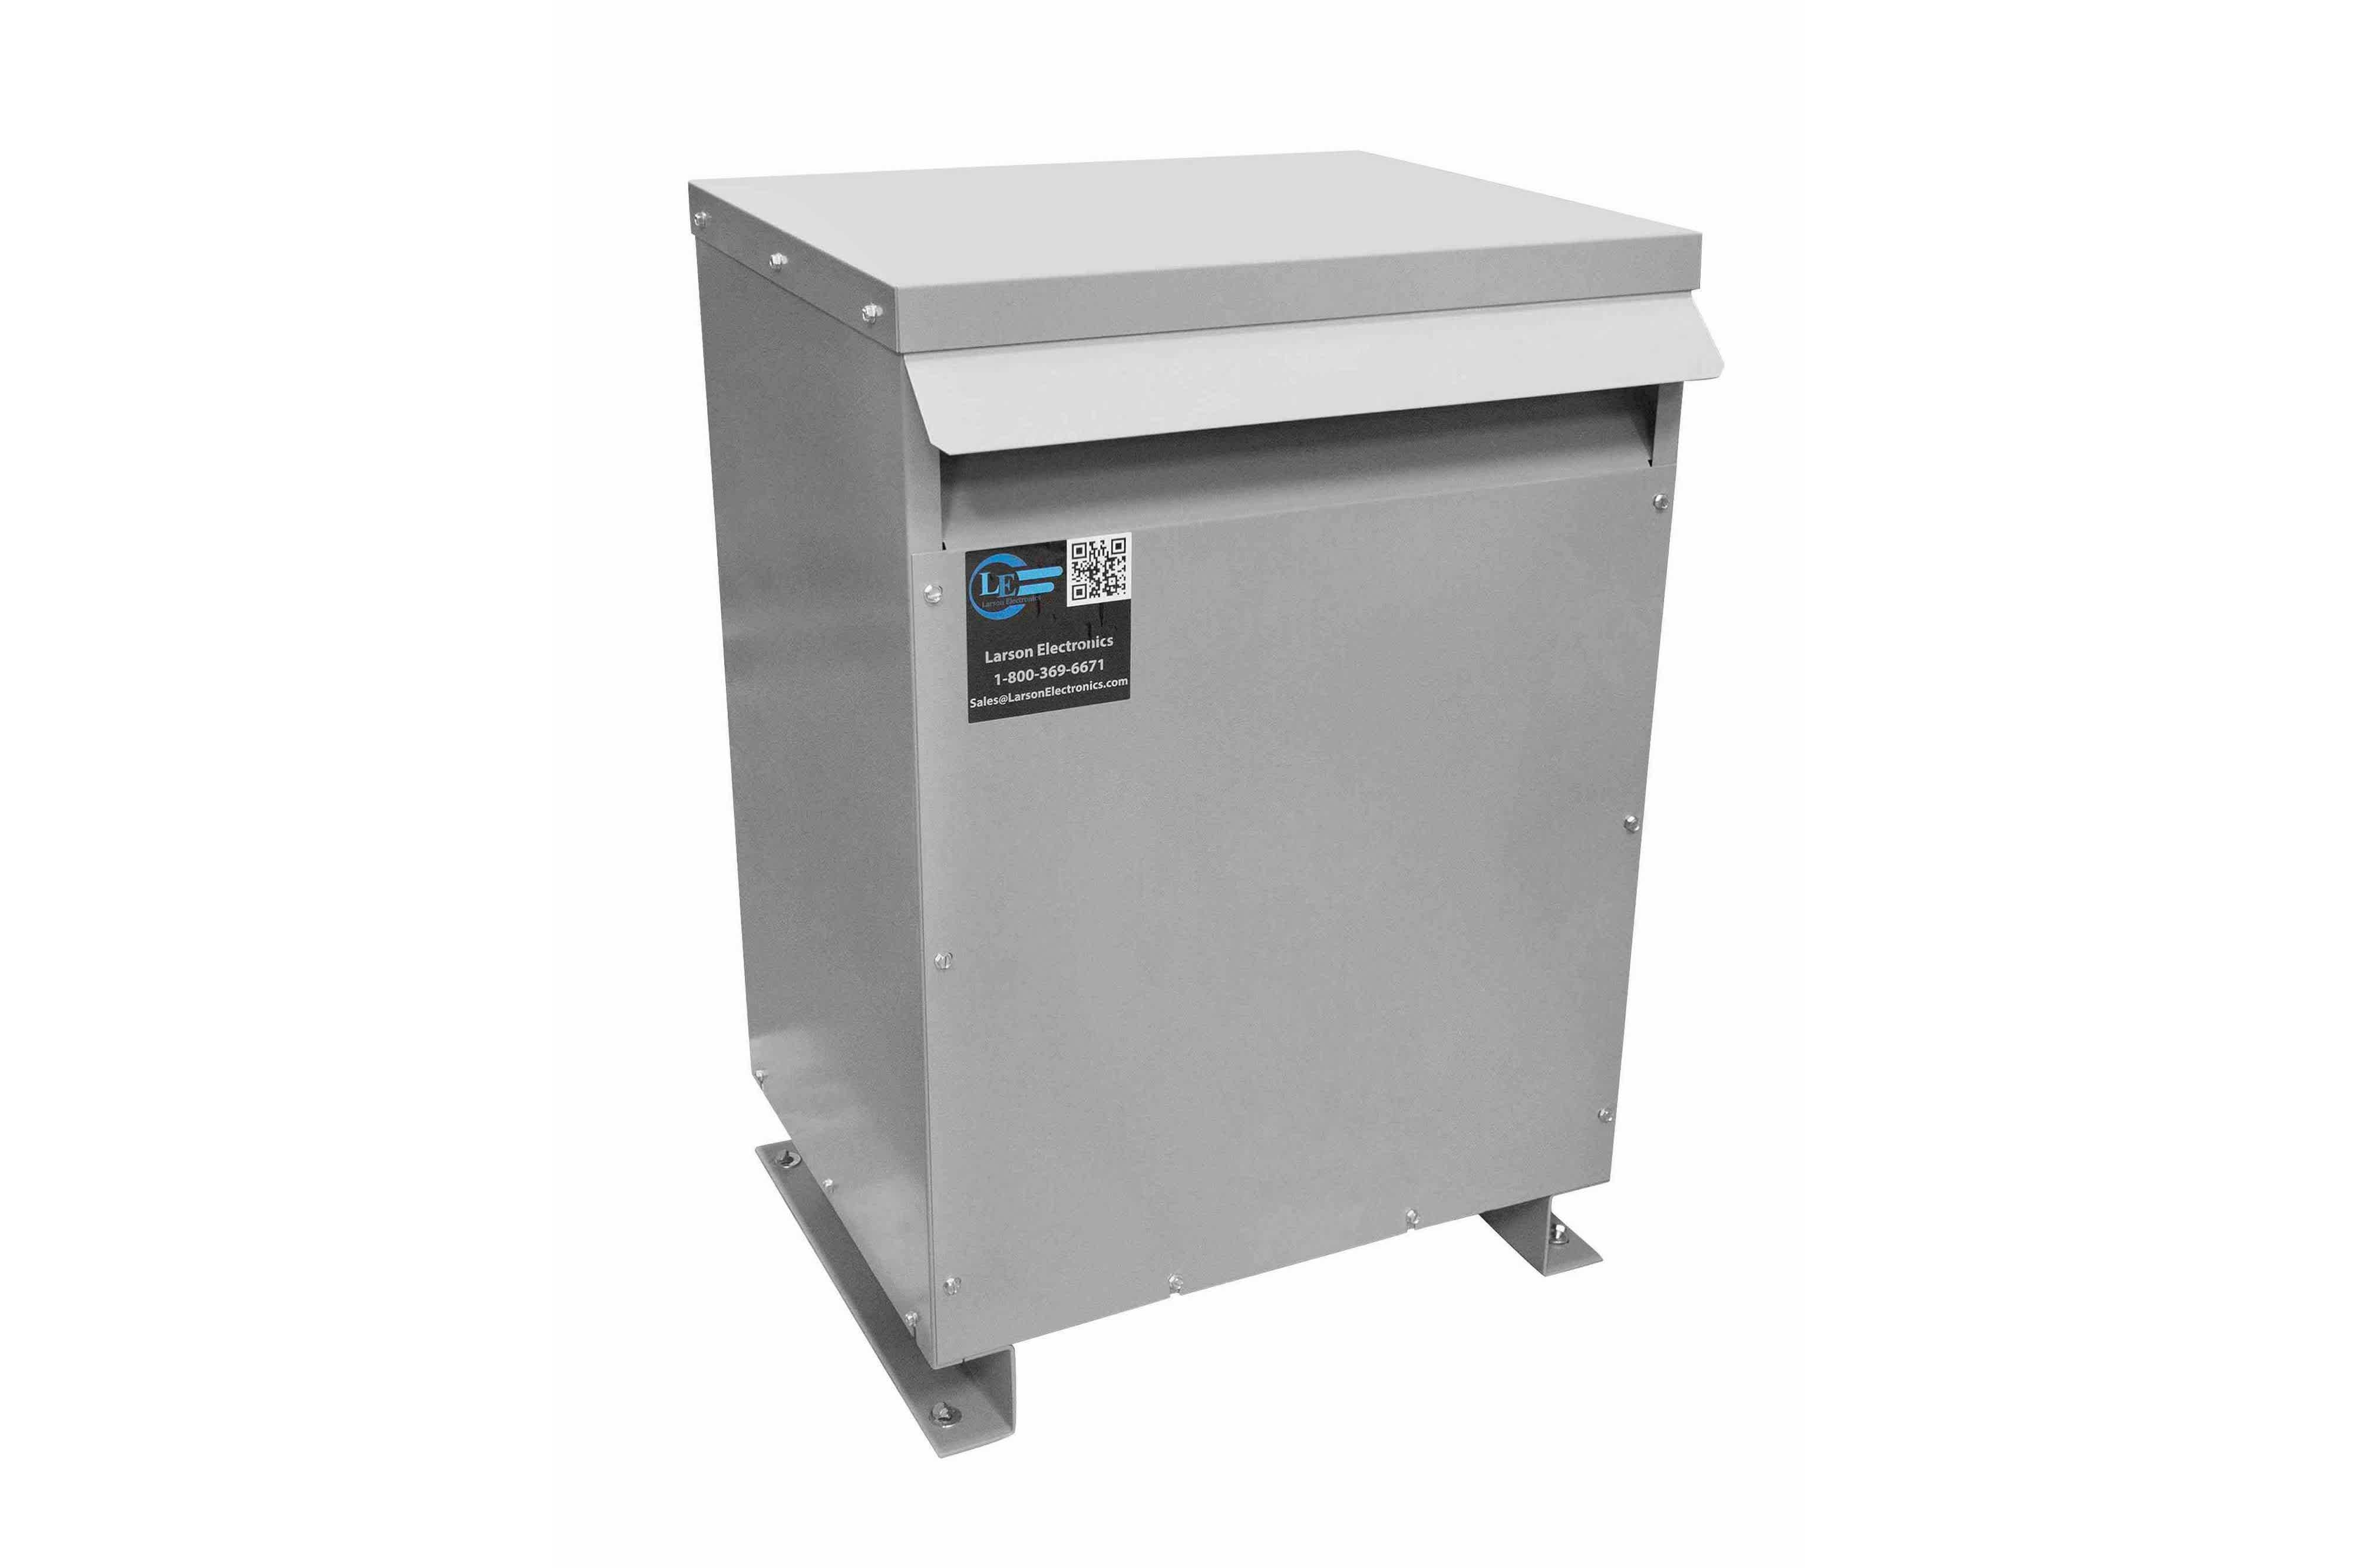 32.5 kVA 3PH Isolation Transformer, 480V Wye Primary, 240V Delta Secondary, N3R, Ventilated, 60 Hz